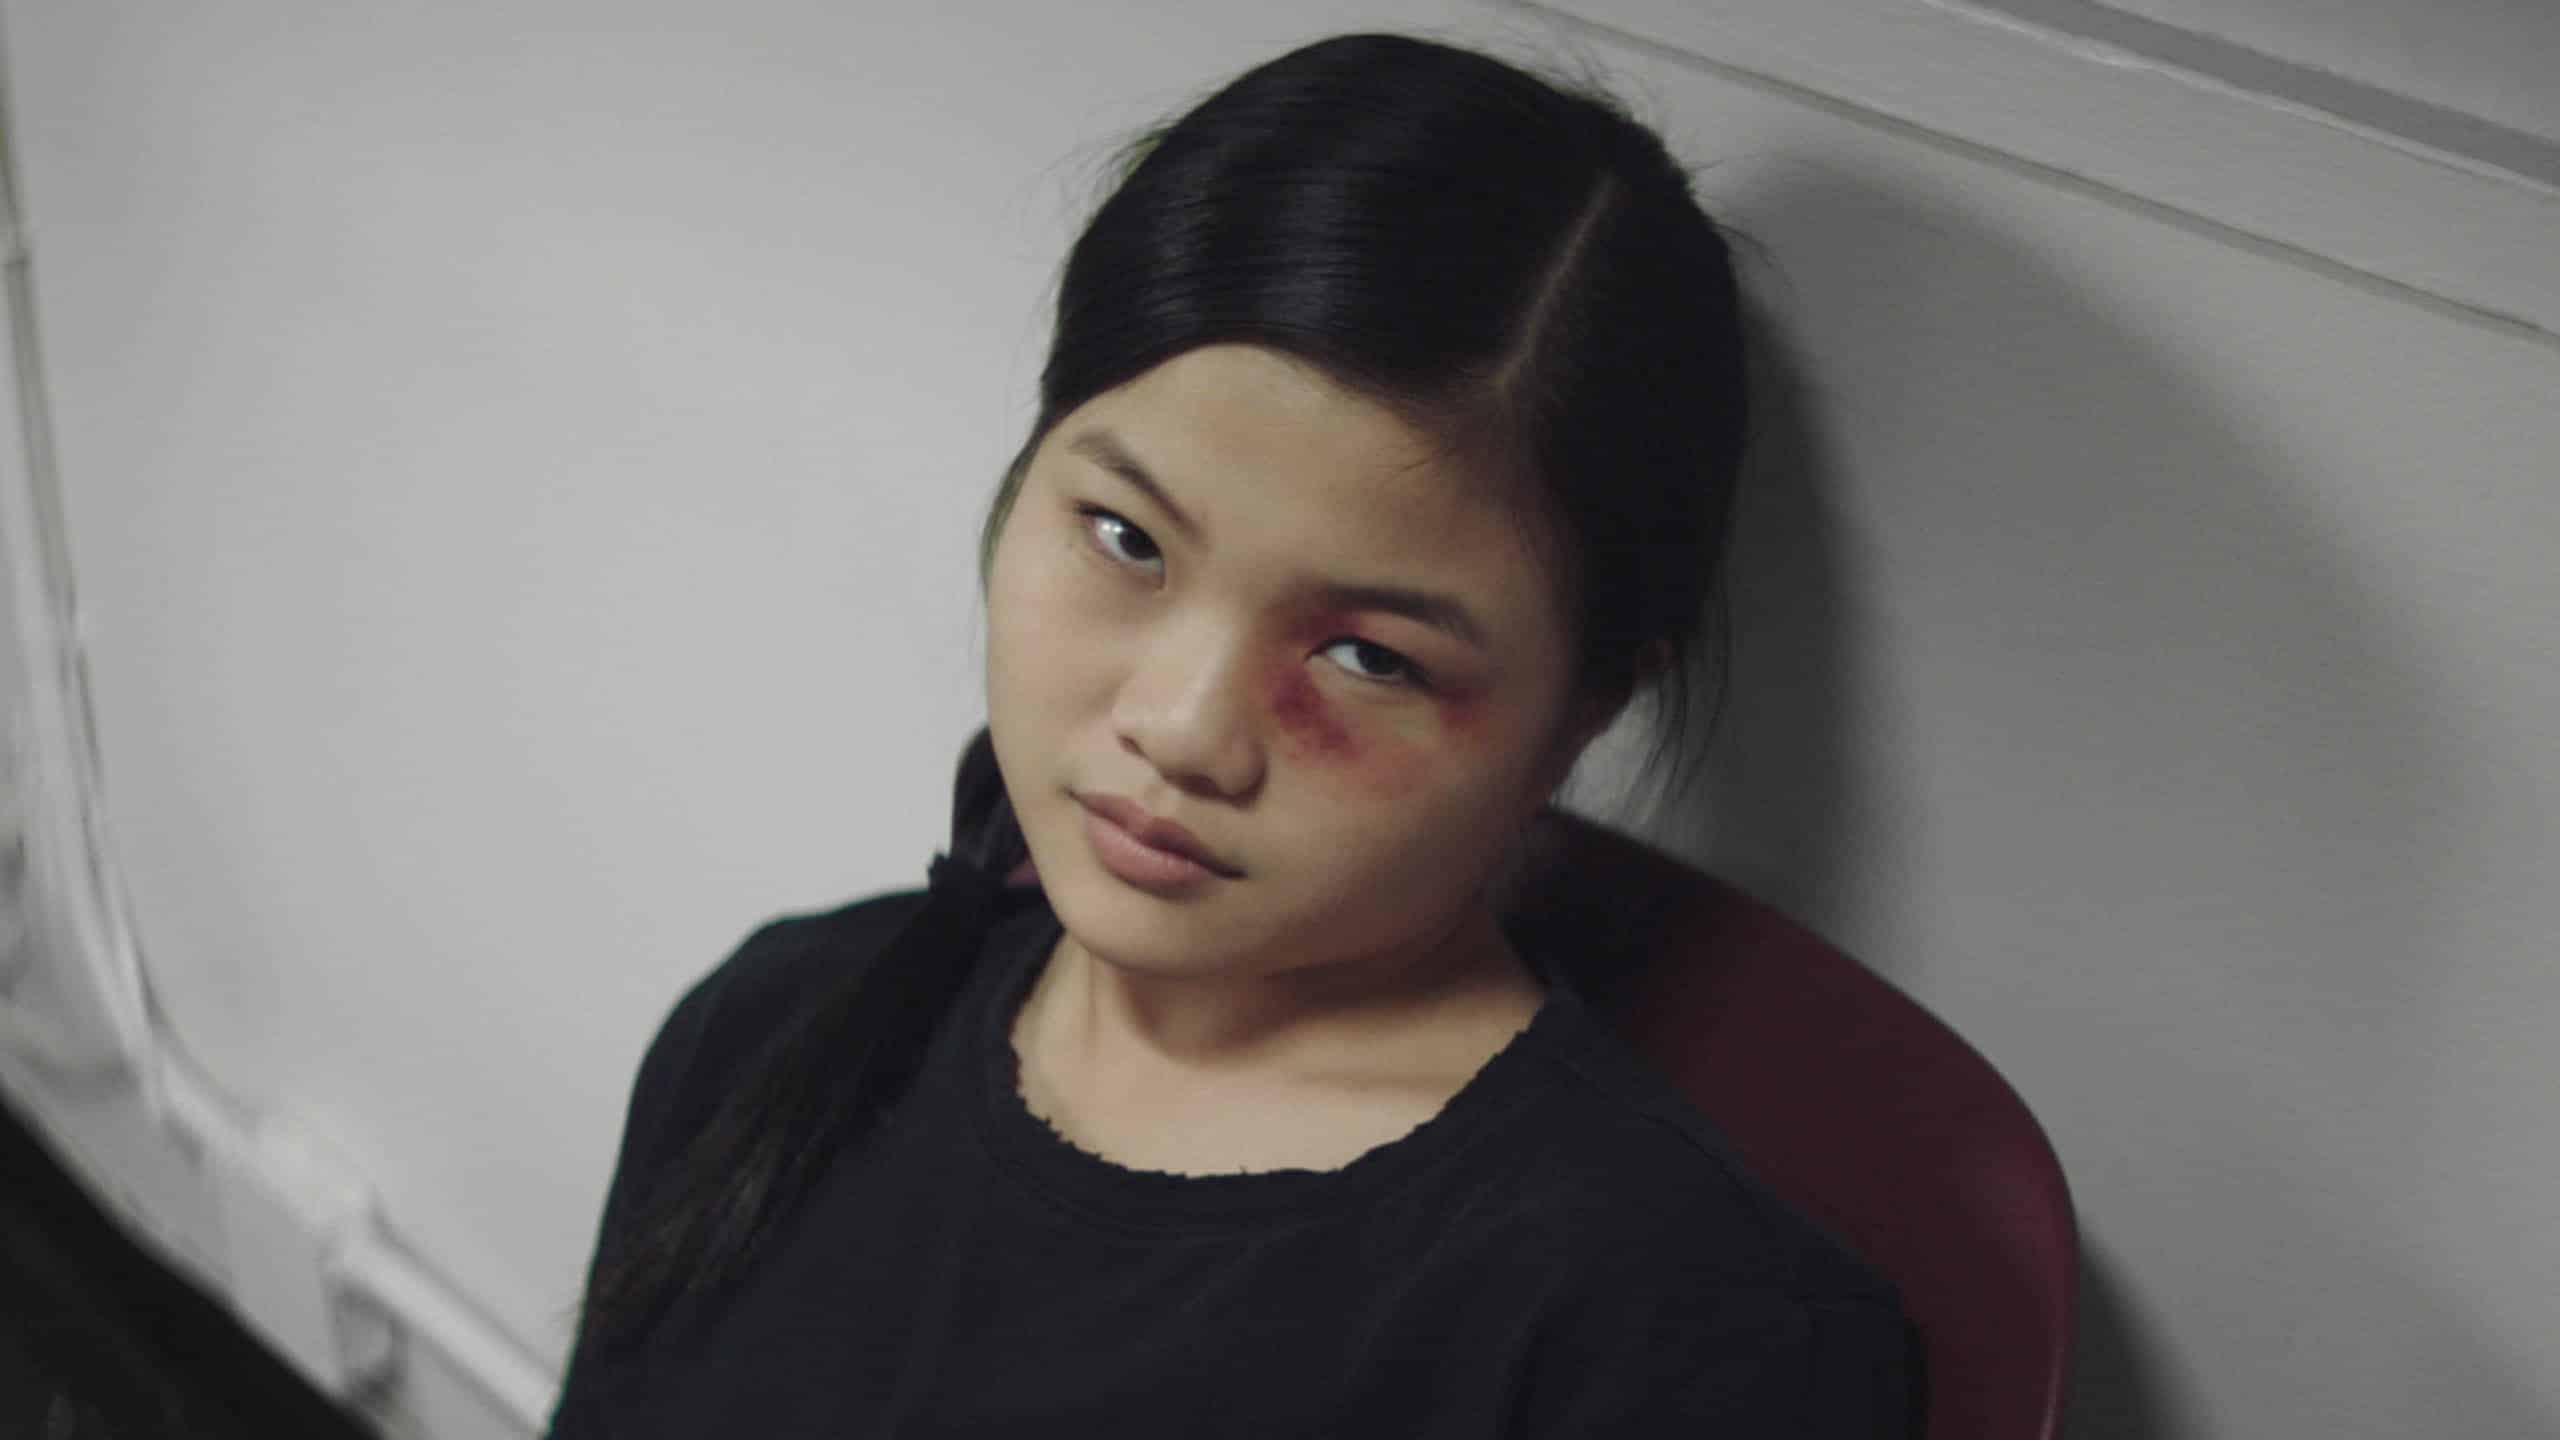 Sammy (Miya Cech) with a black eye.